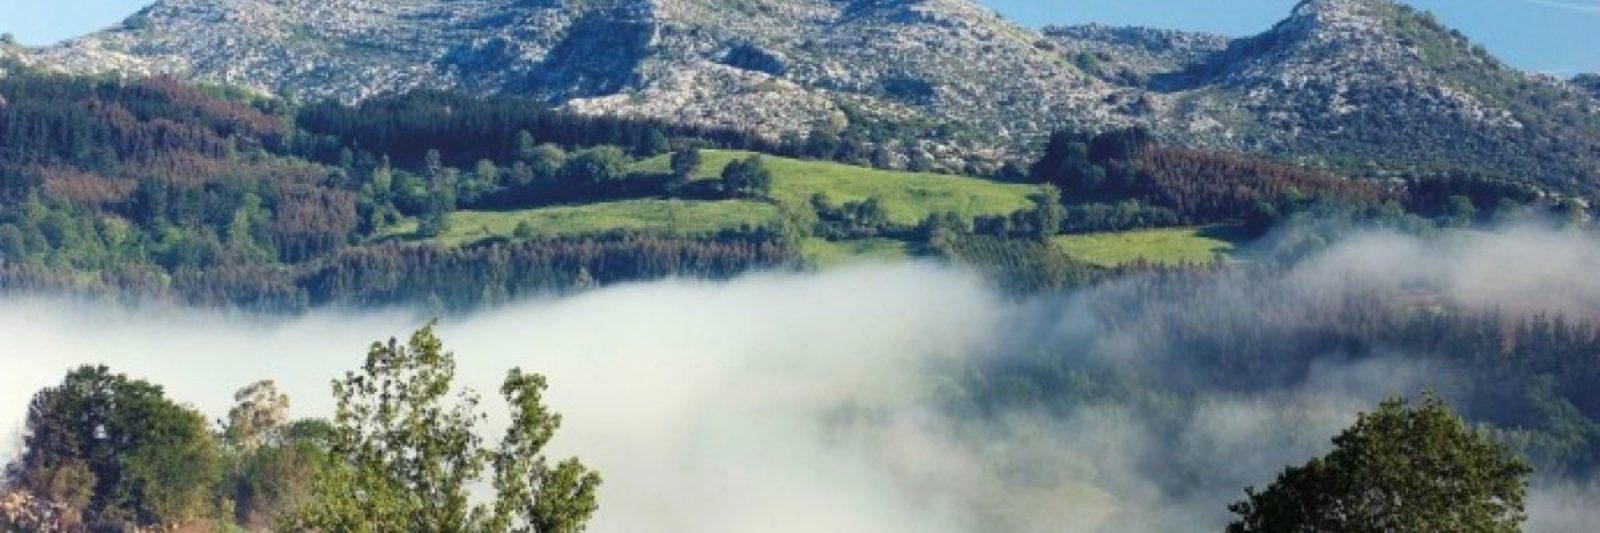 armanon-natural-park